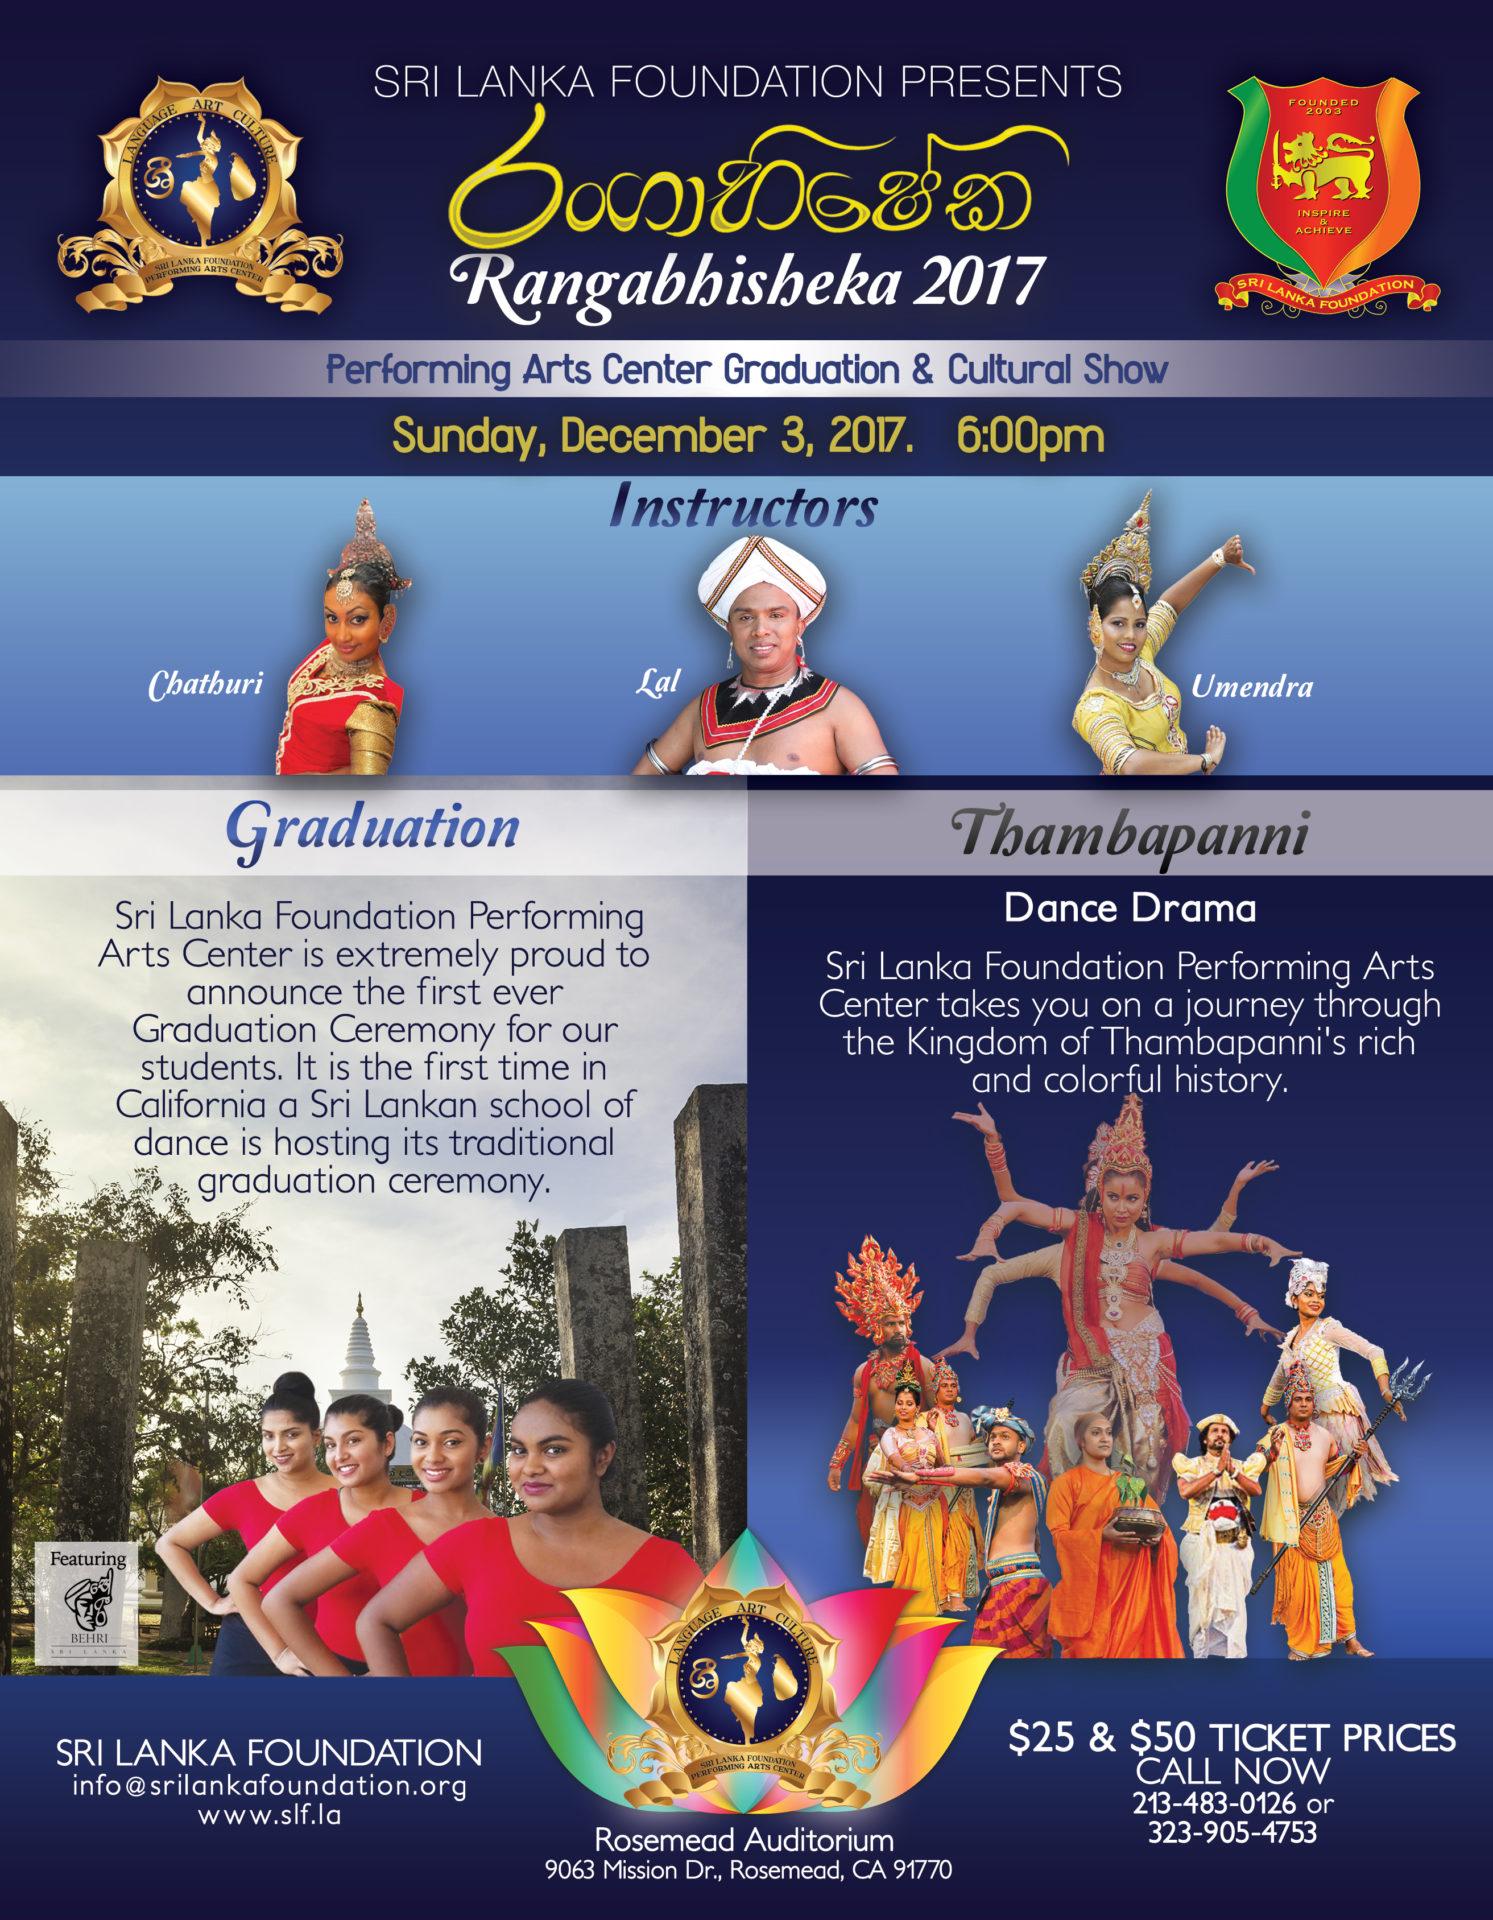 Rangabhisheka 2017